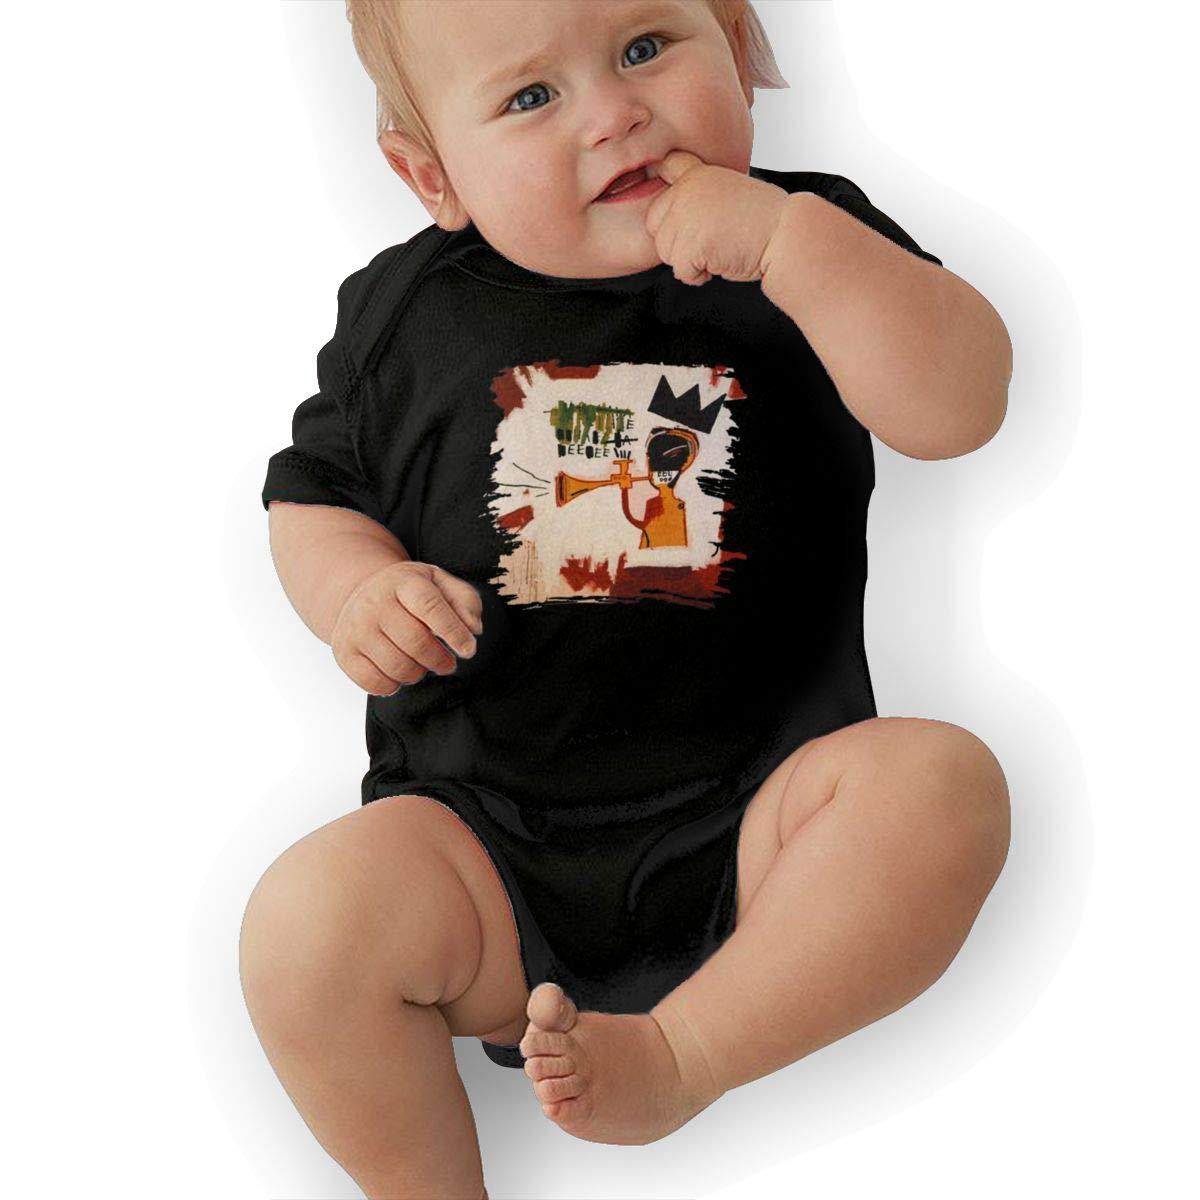 Jean-Michel-Basquiat Infant Toddler Baby Boy Girl Romper Summer Jumpsuit Short Sleeve Clothing Set